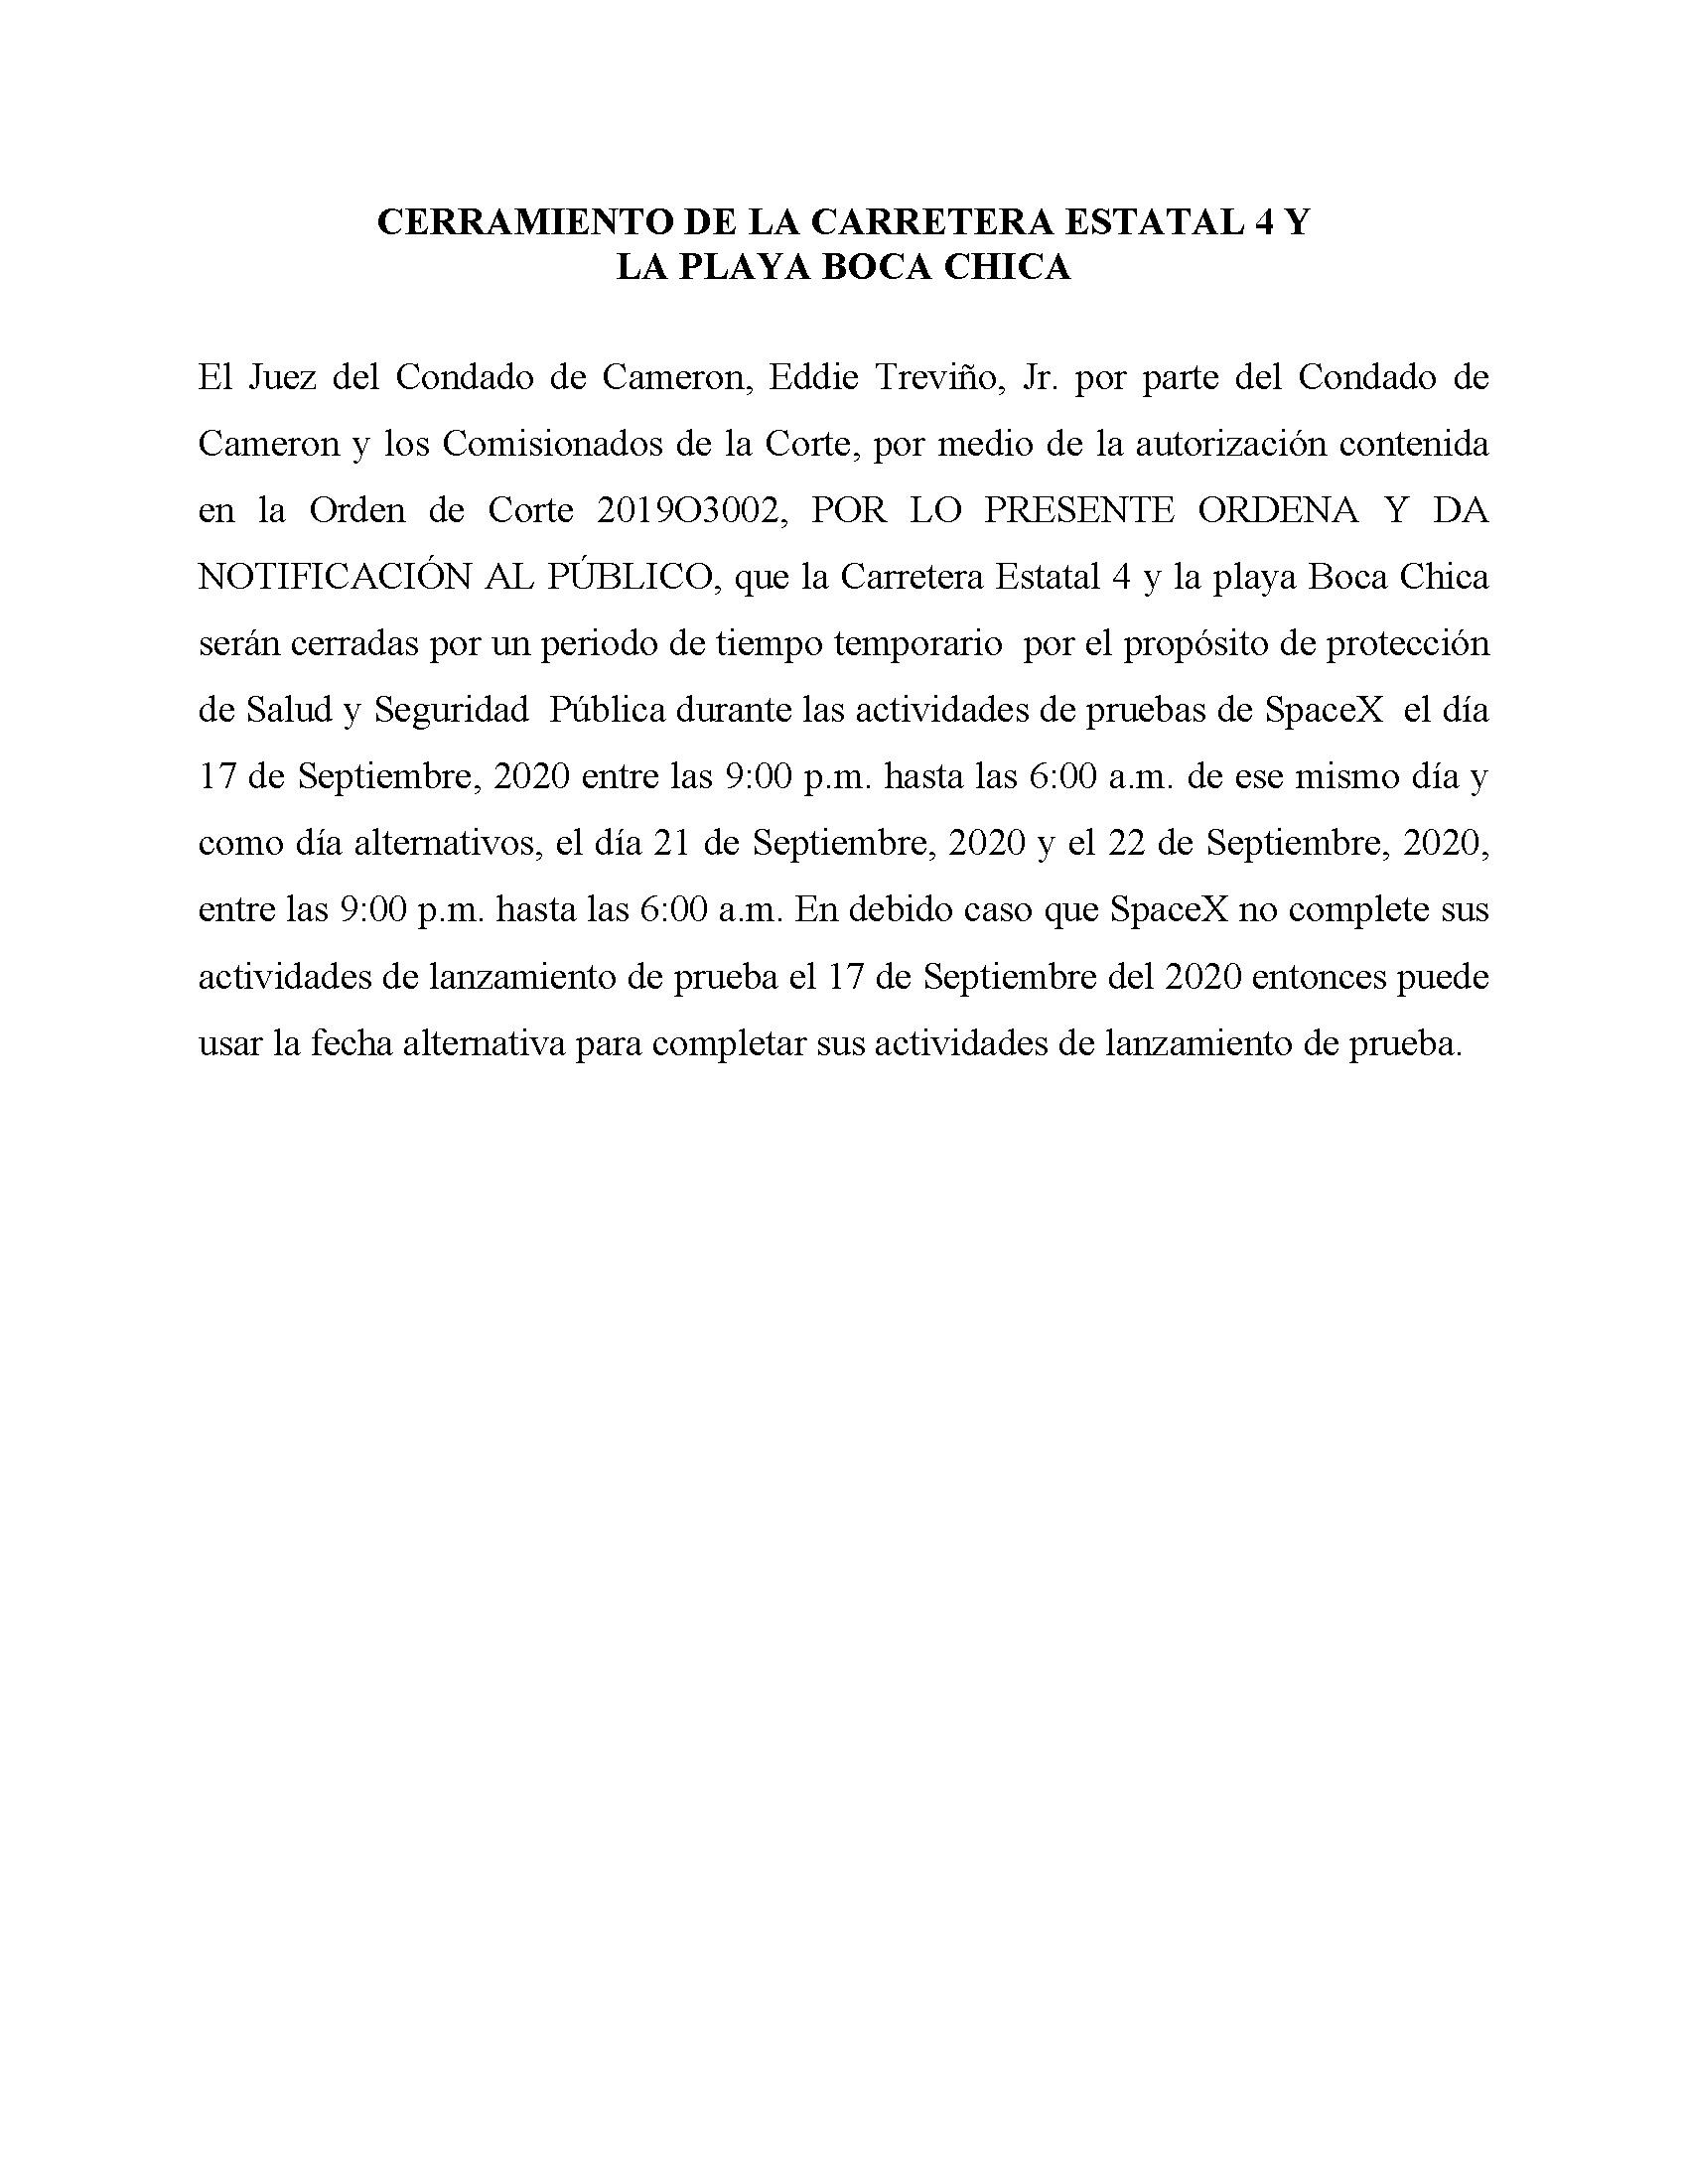 ORDER.CLOSURE OF HIGHWAY 4 Y LA PLAYA BOCA CHICA.SPANISH.9.17.20